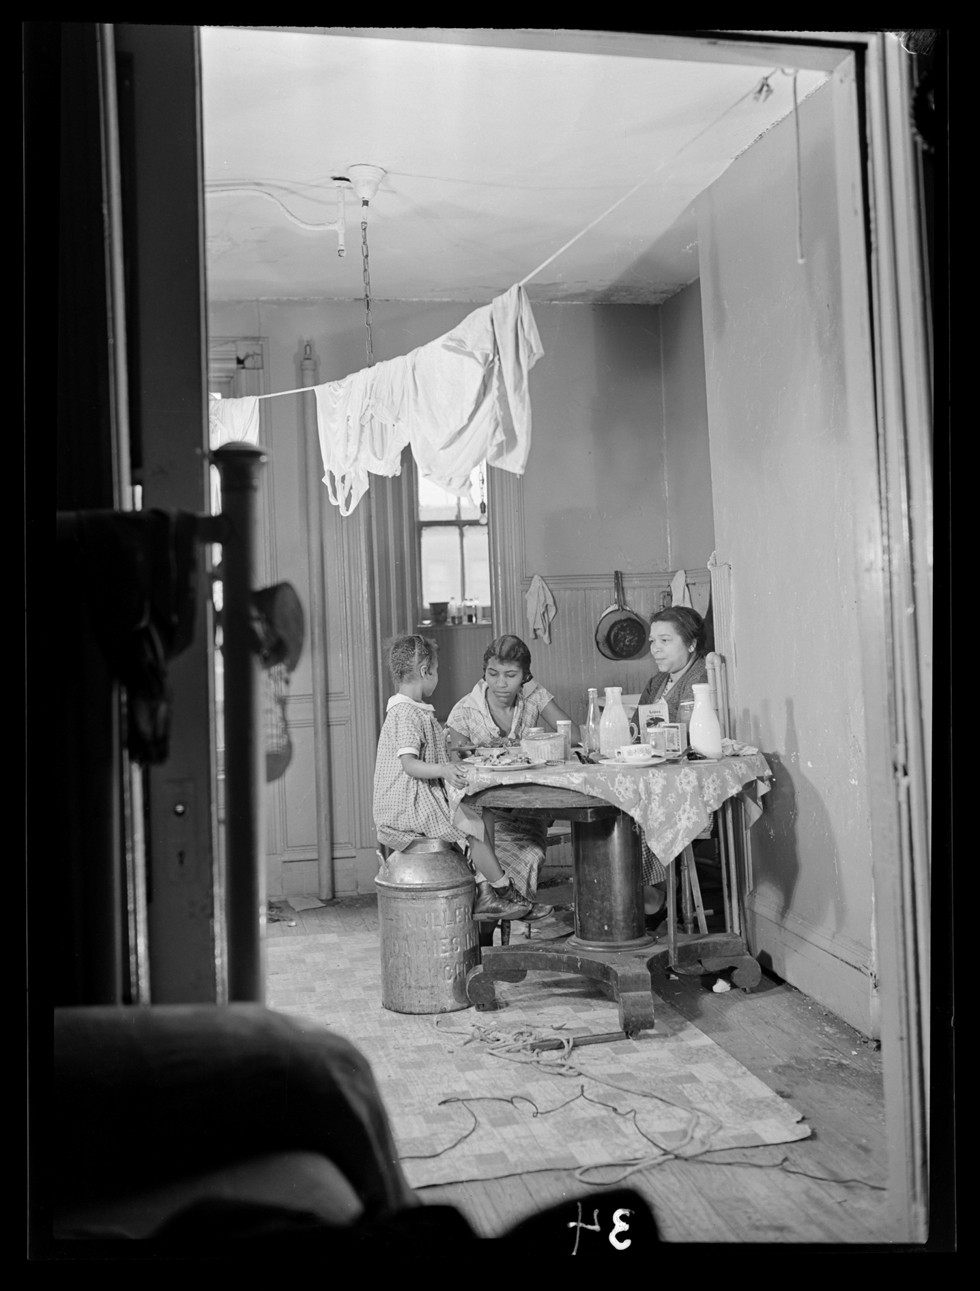 Harlem document, 1937-40. Photographed by Aaron Siskind © Courtesy the Aaron Siskind Foundation